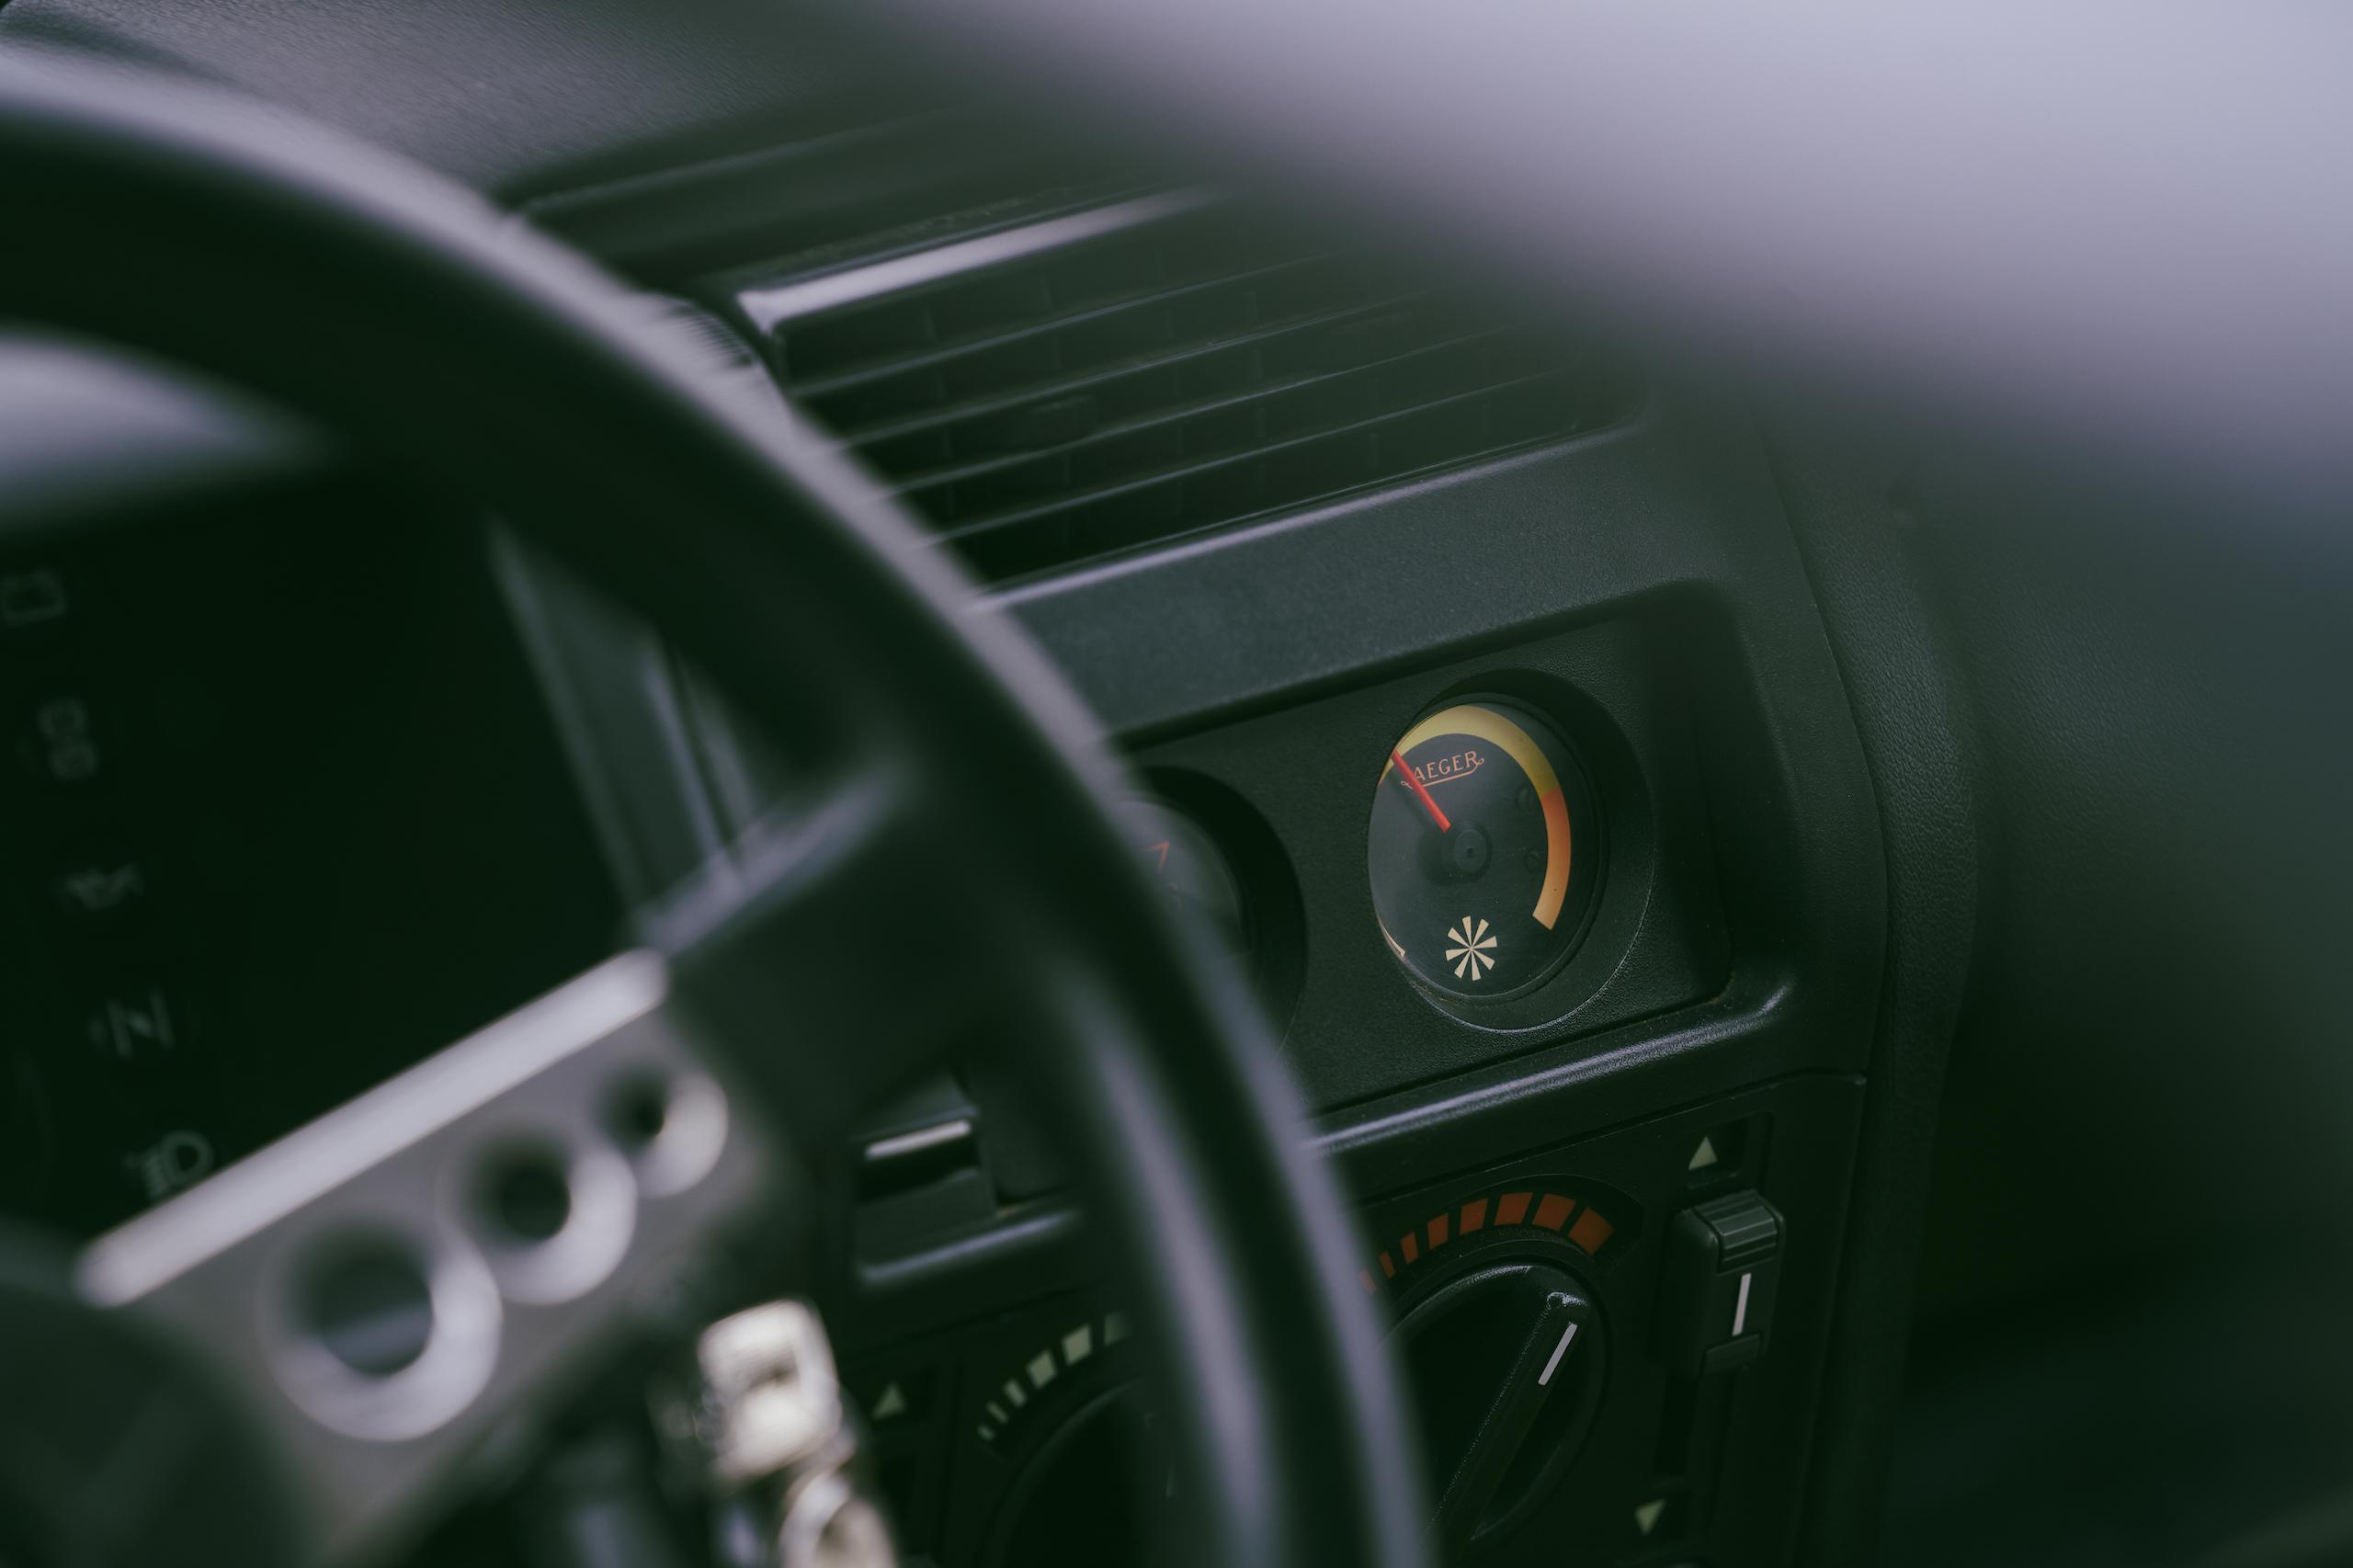 1985 Renault R5 Turbo 2 interior temp detail